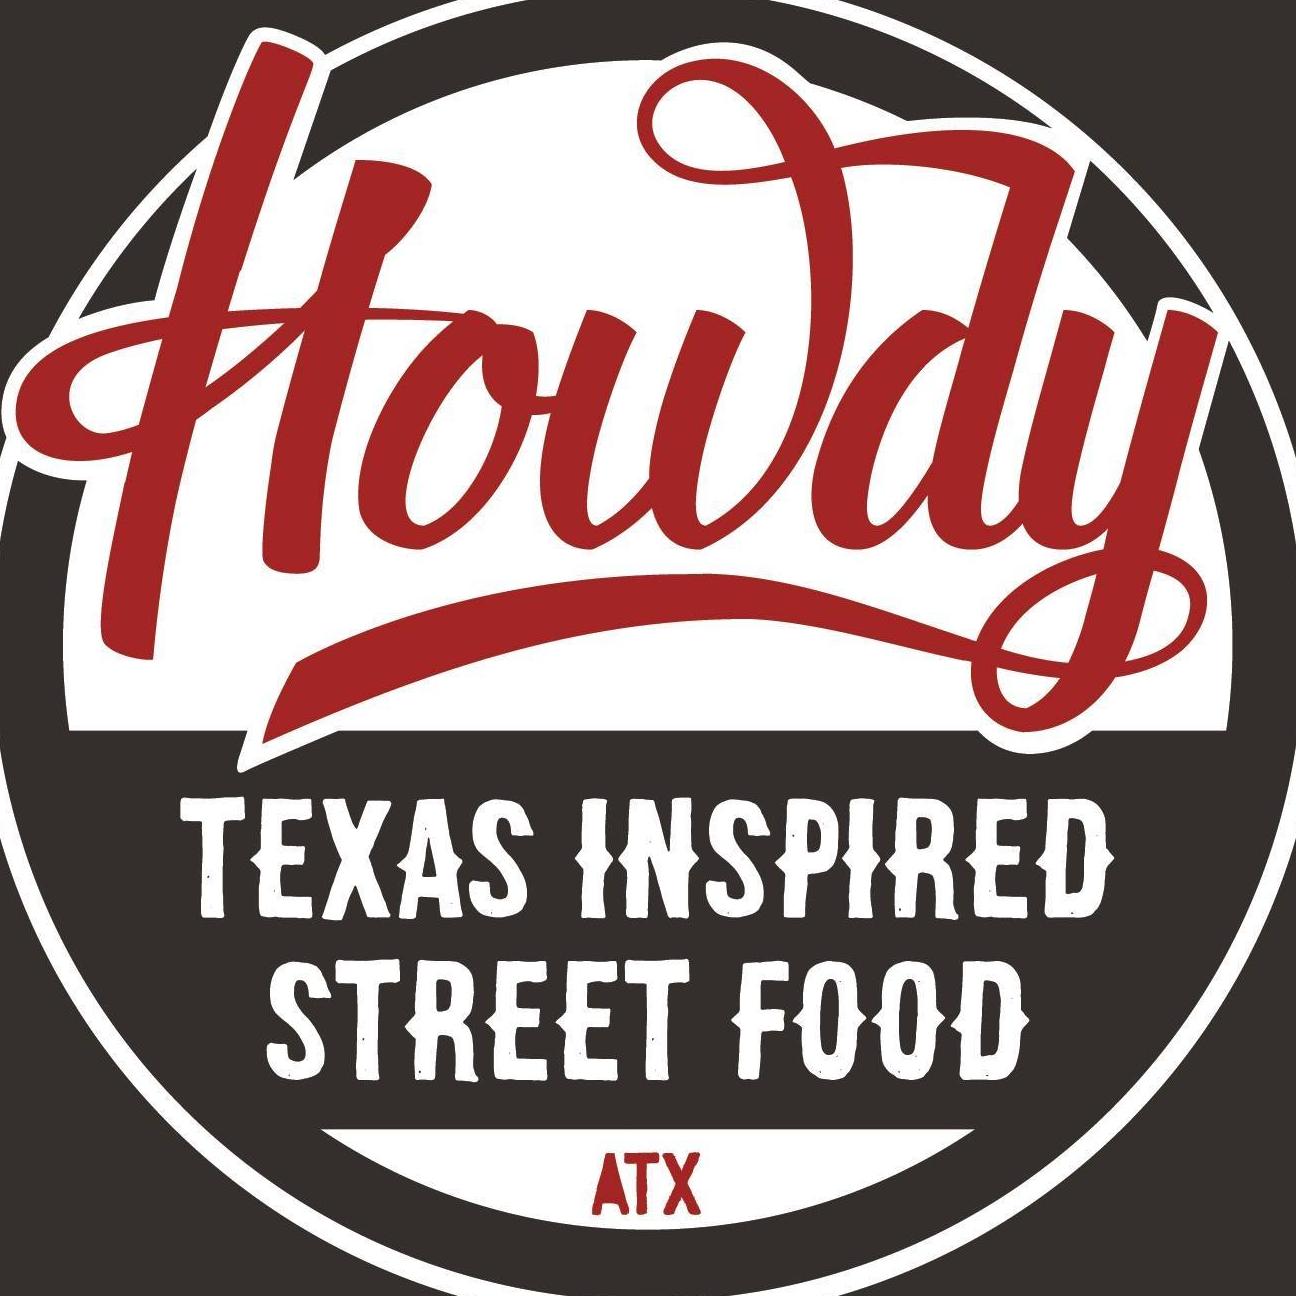 Howdy Food Truck ATX logo